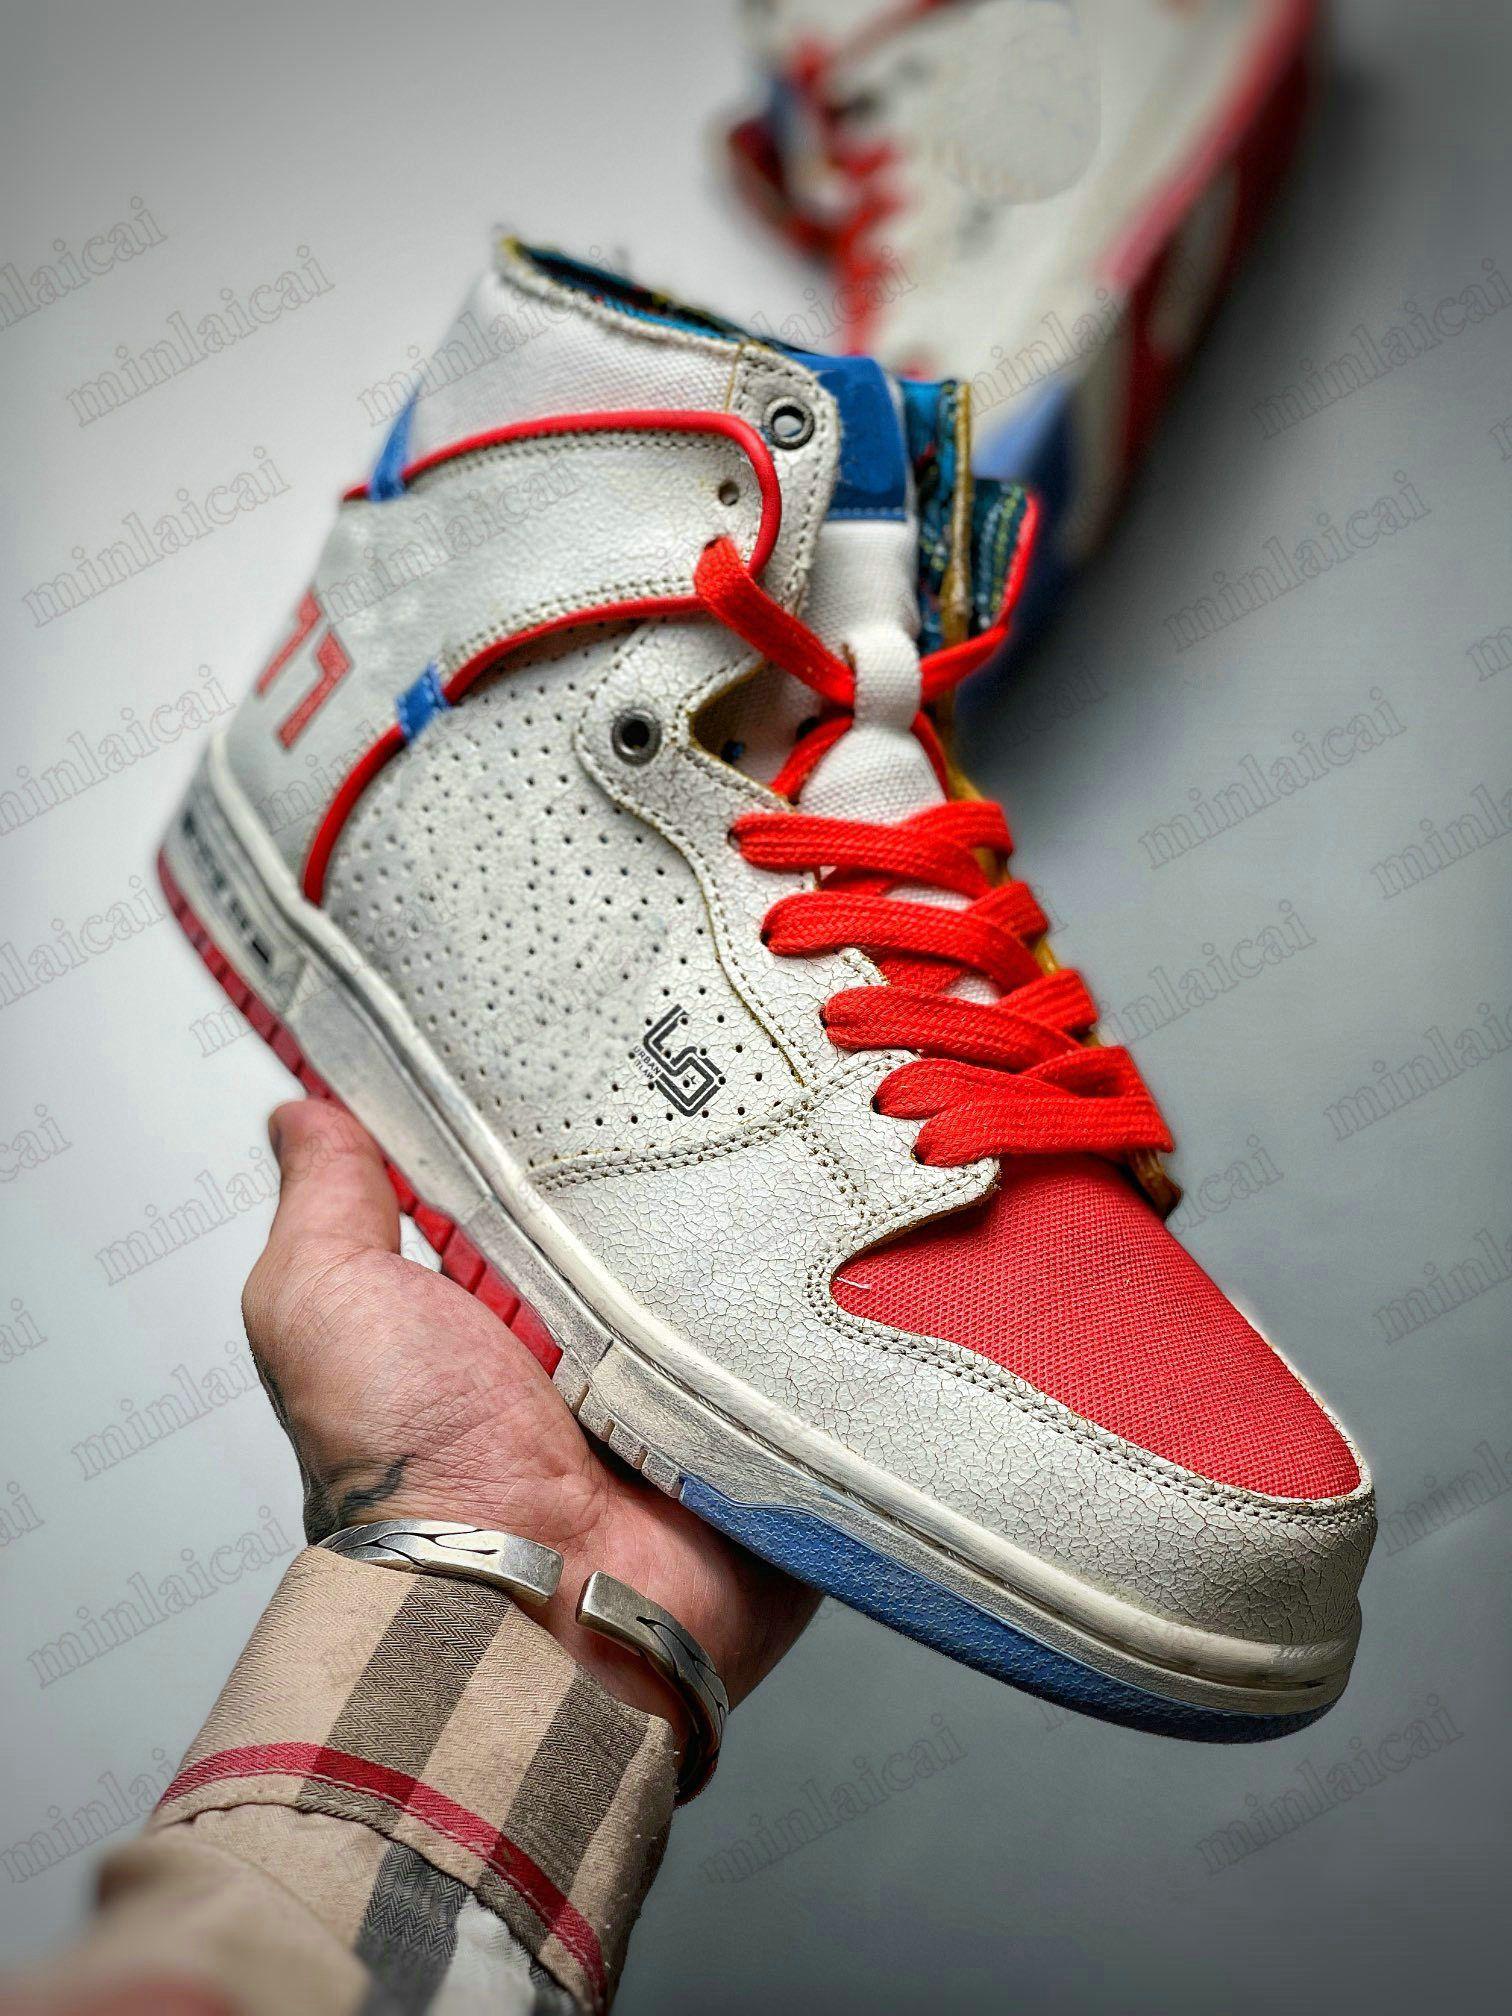 Ishod Wair x Magnus Walker High Dunks Designer Sportschuhe Urban Outlaw Weiß Blau Rot 277 Dunk Trainer Skateboard Sneakers